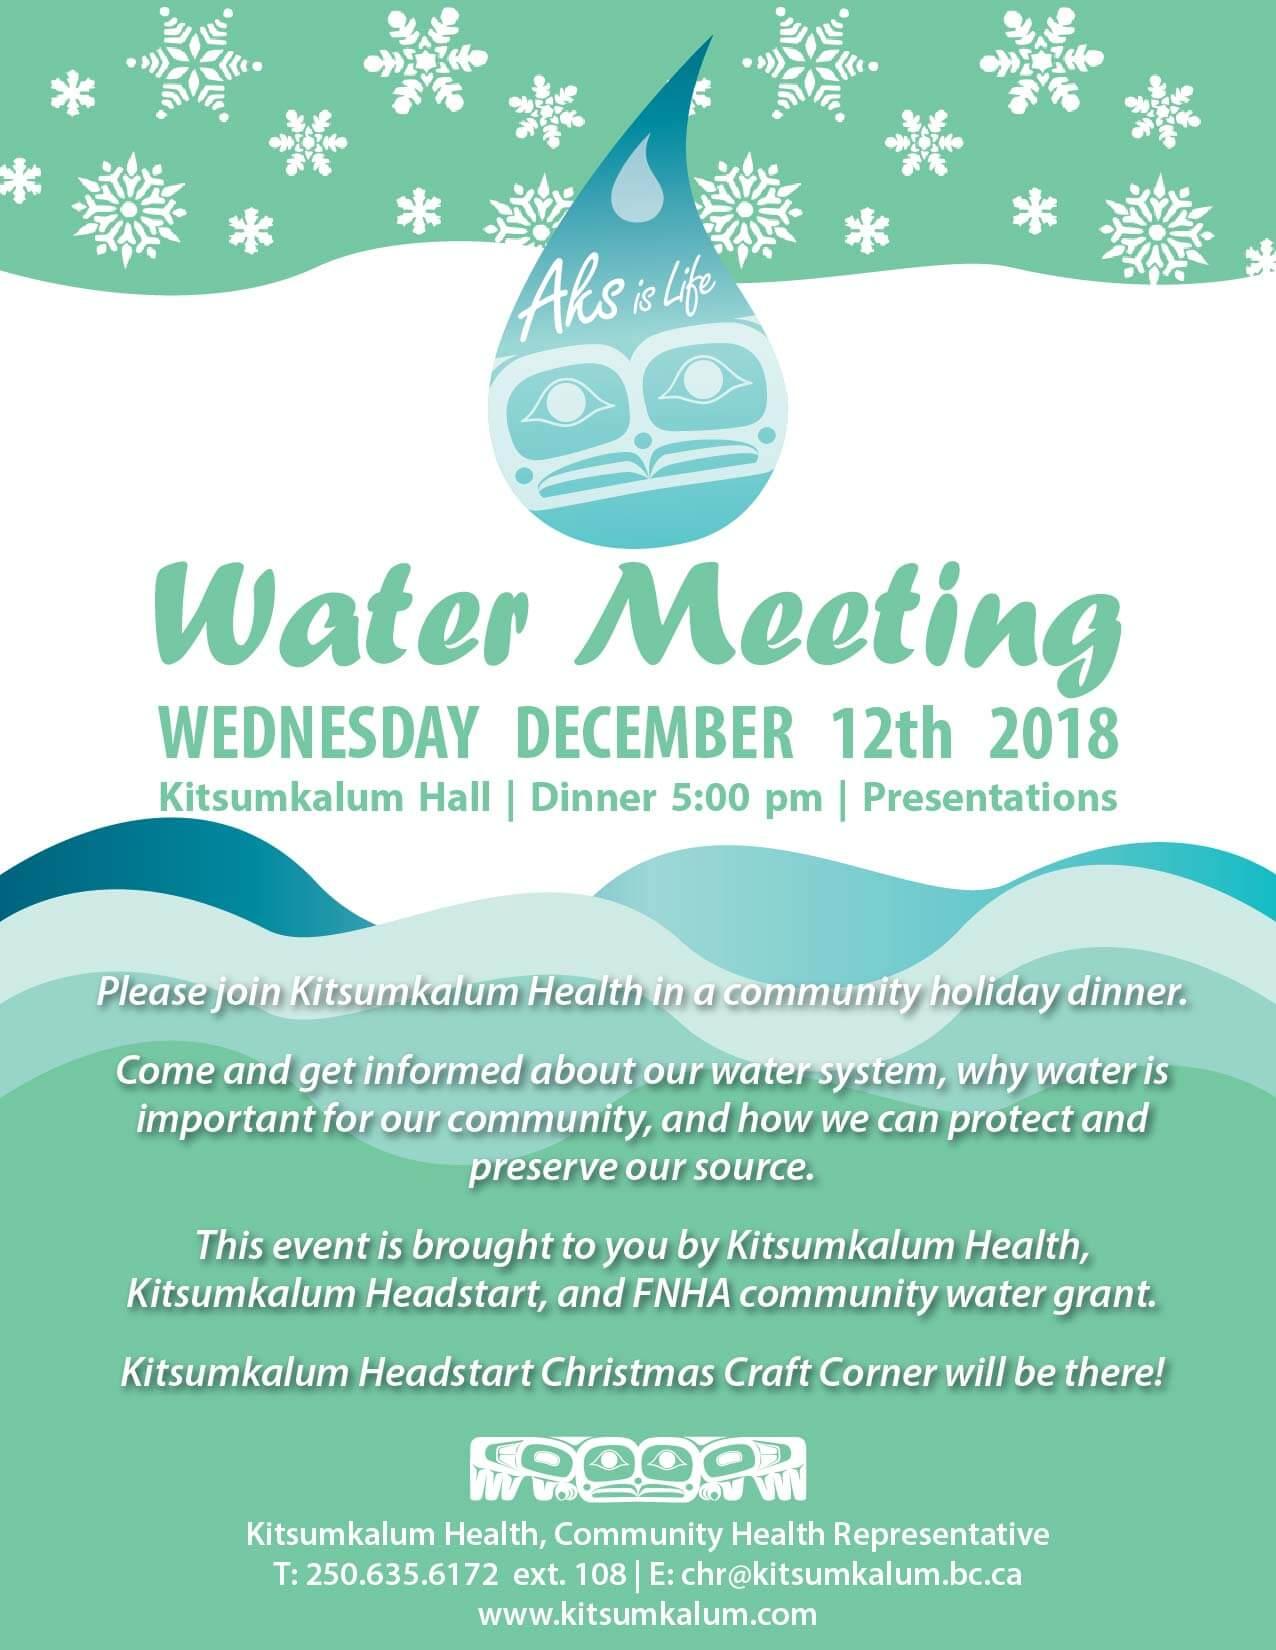 Kitsumkalum Water Meeting and Holiday Dinner DEC 12